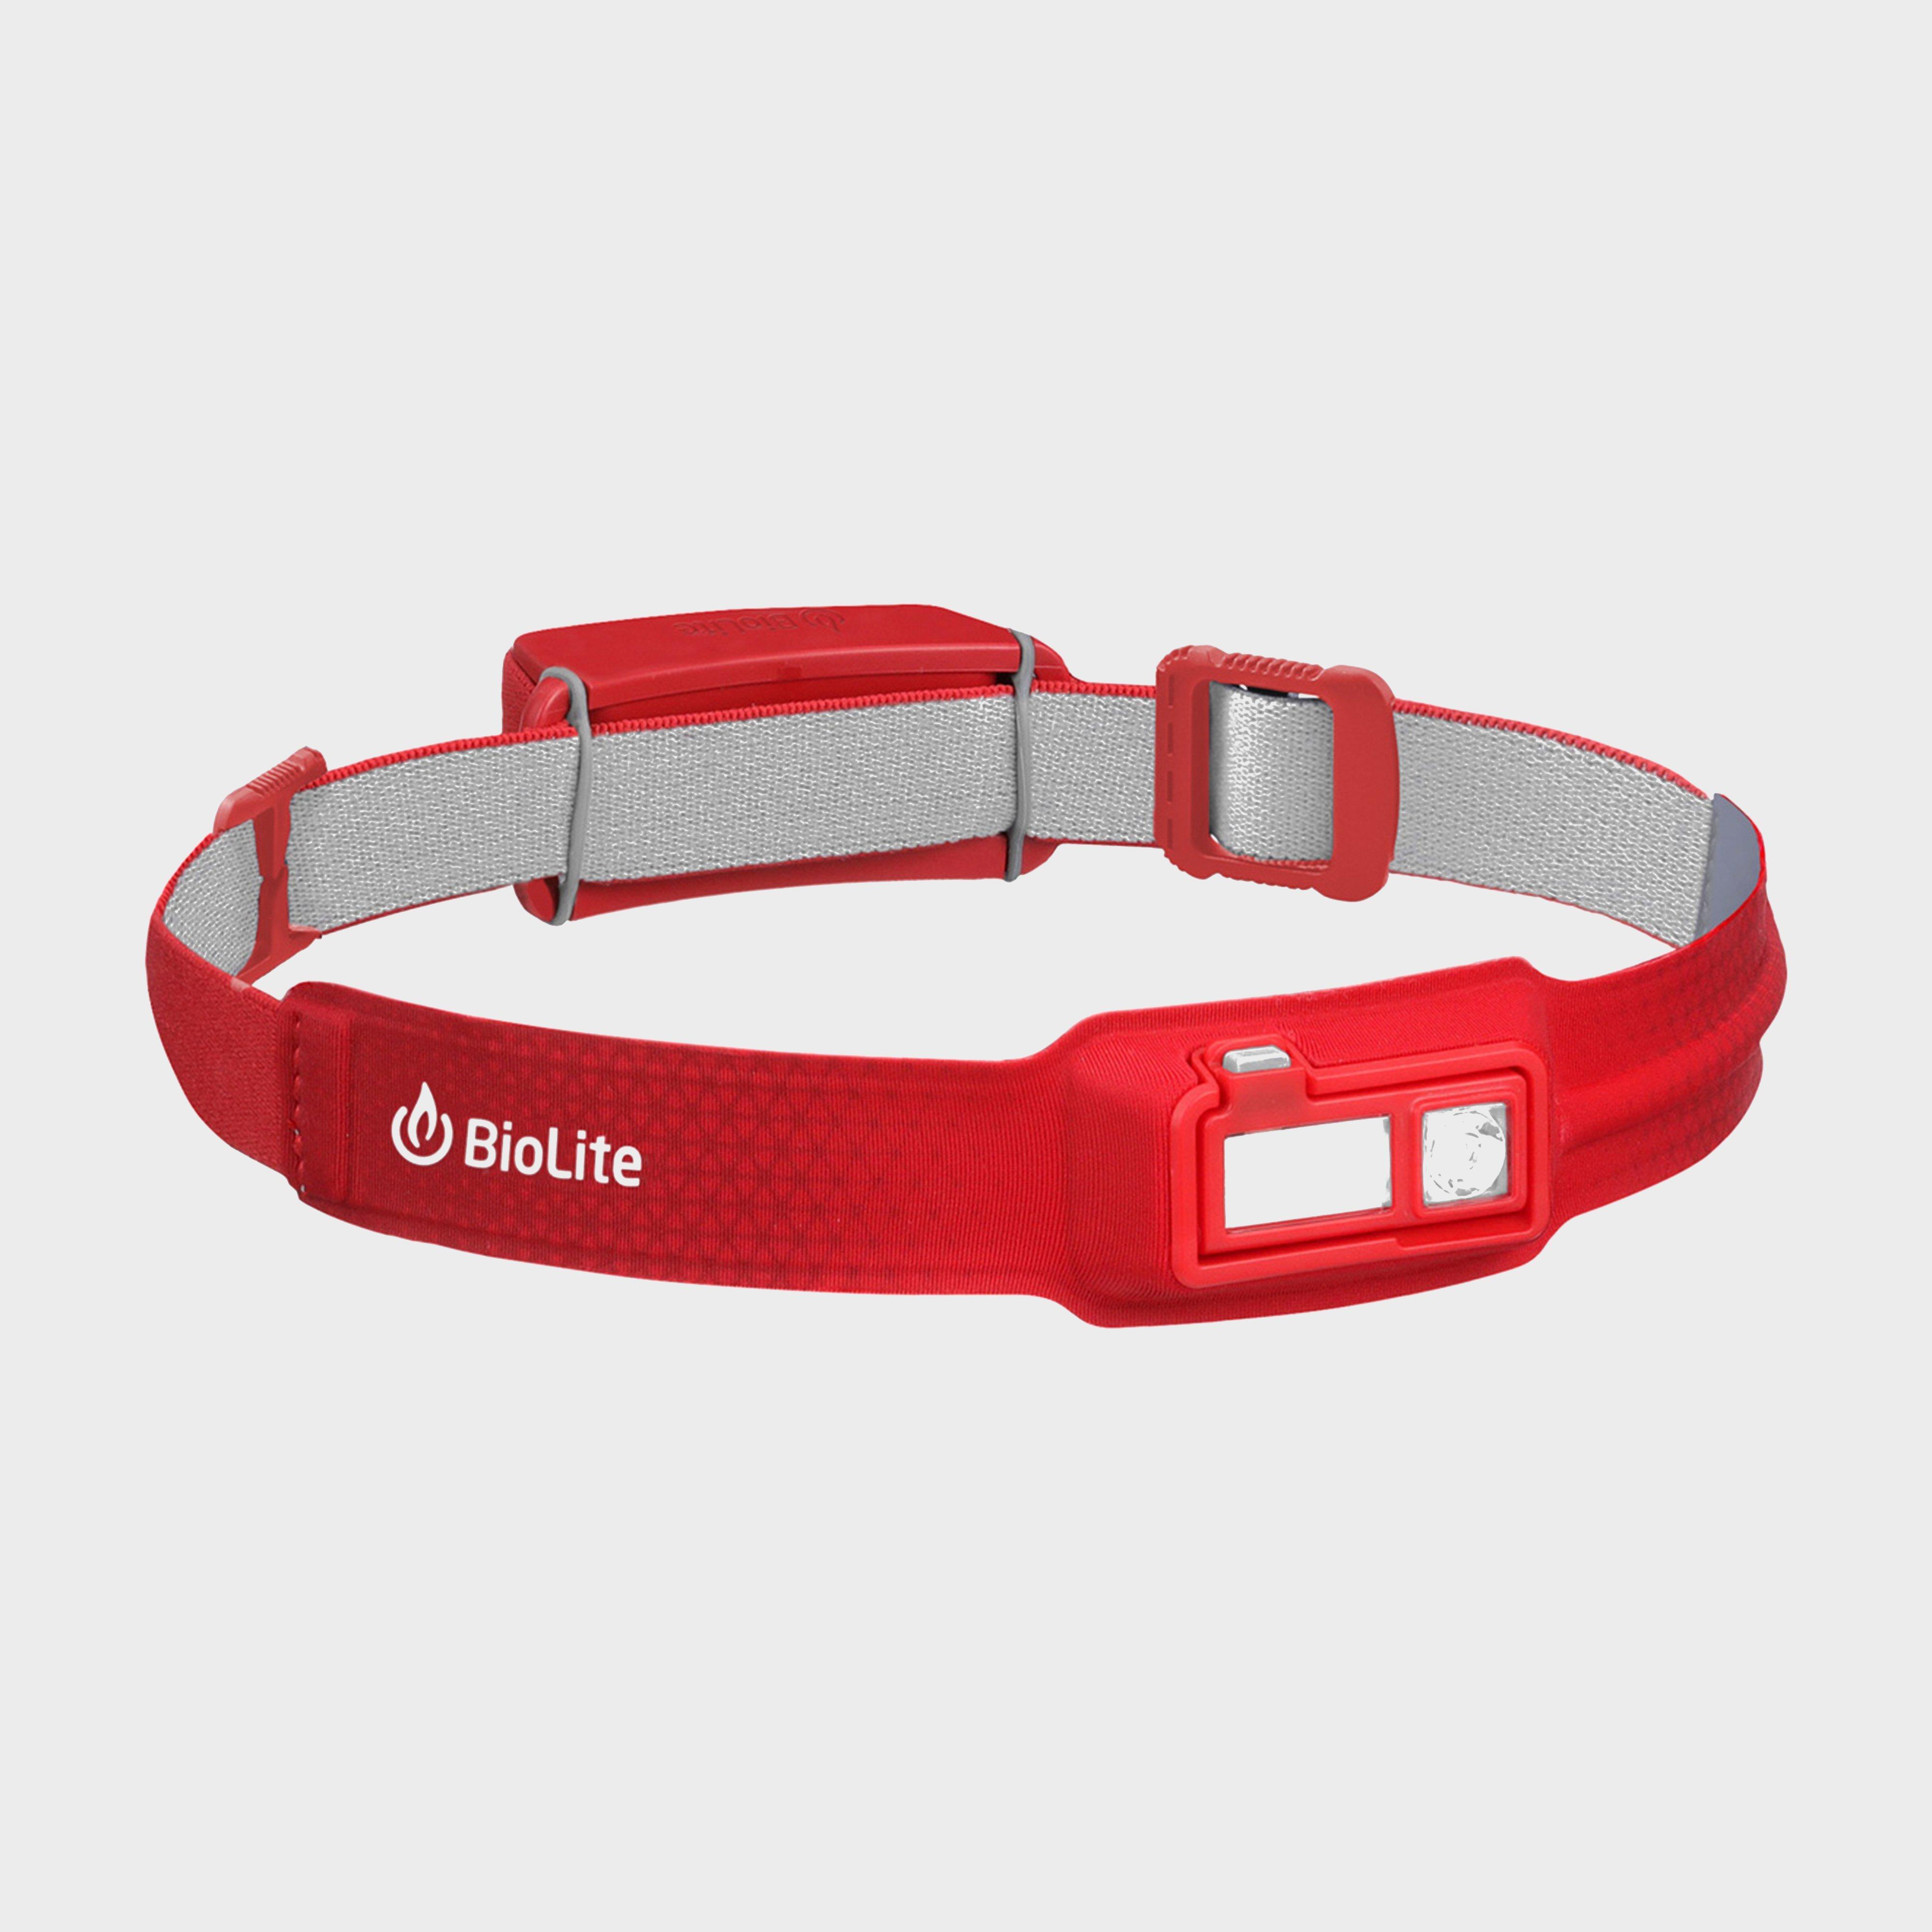 Biolite Biolite - Red/headlamp  Red/headlamp